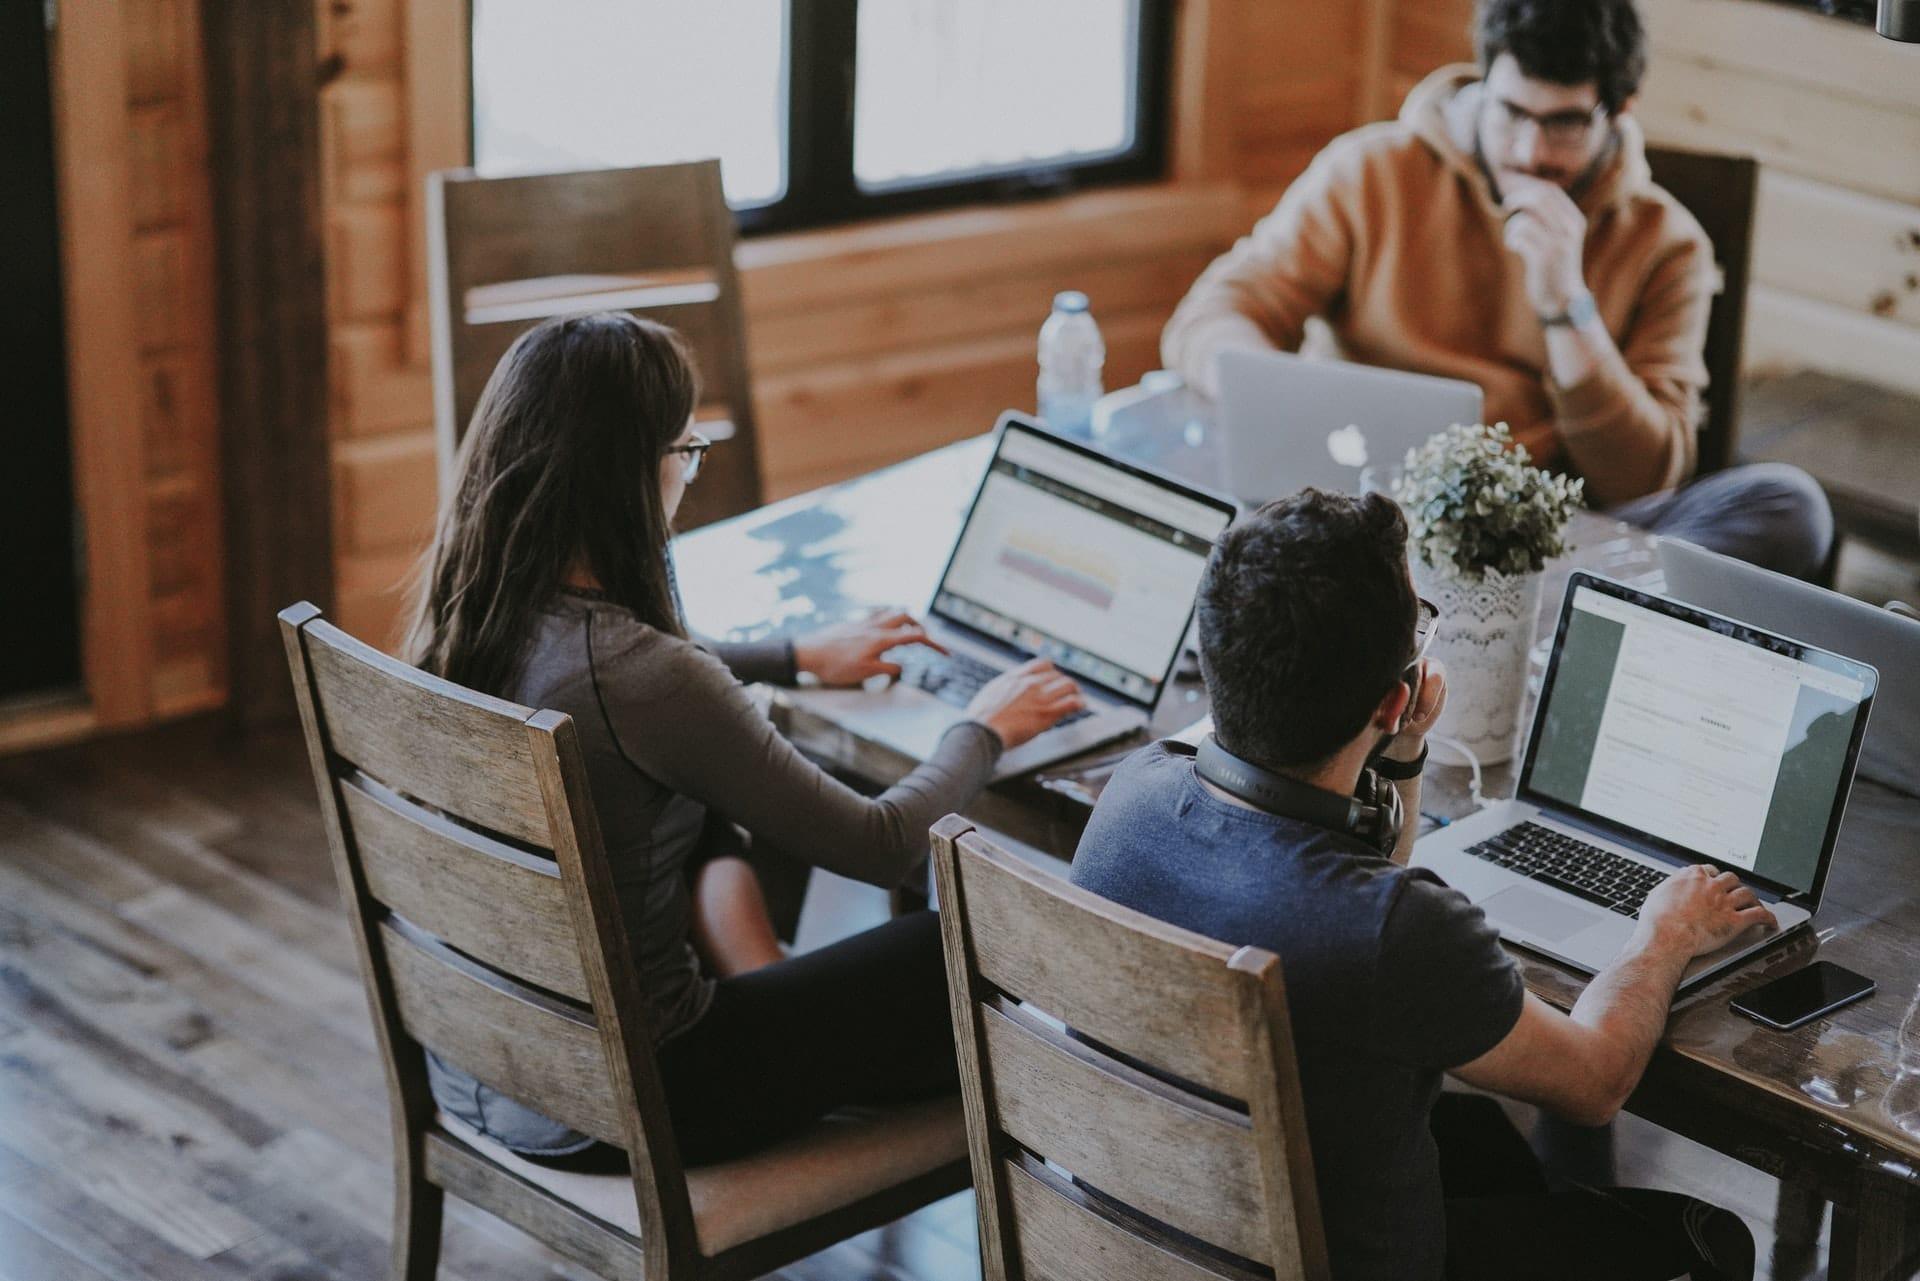 Group using laptops